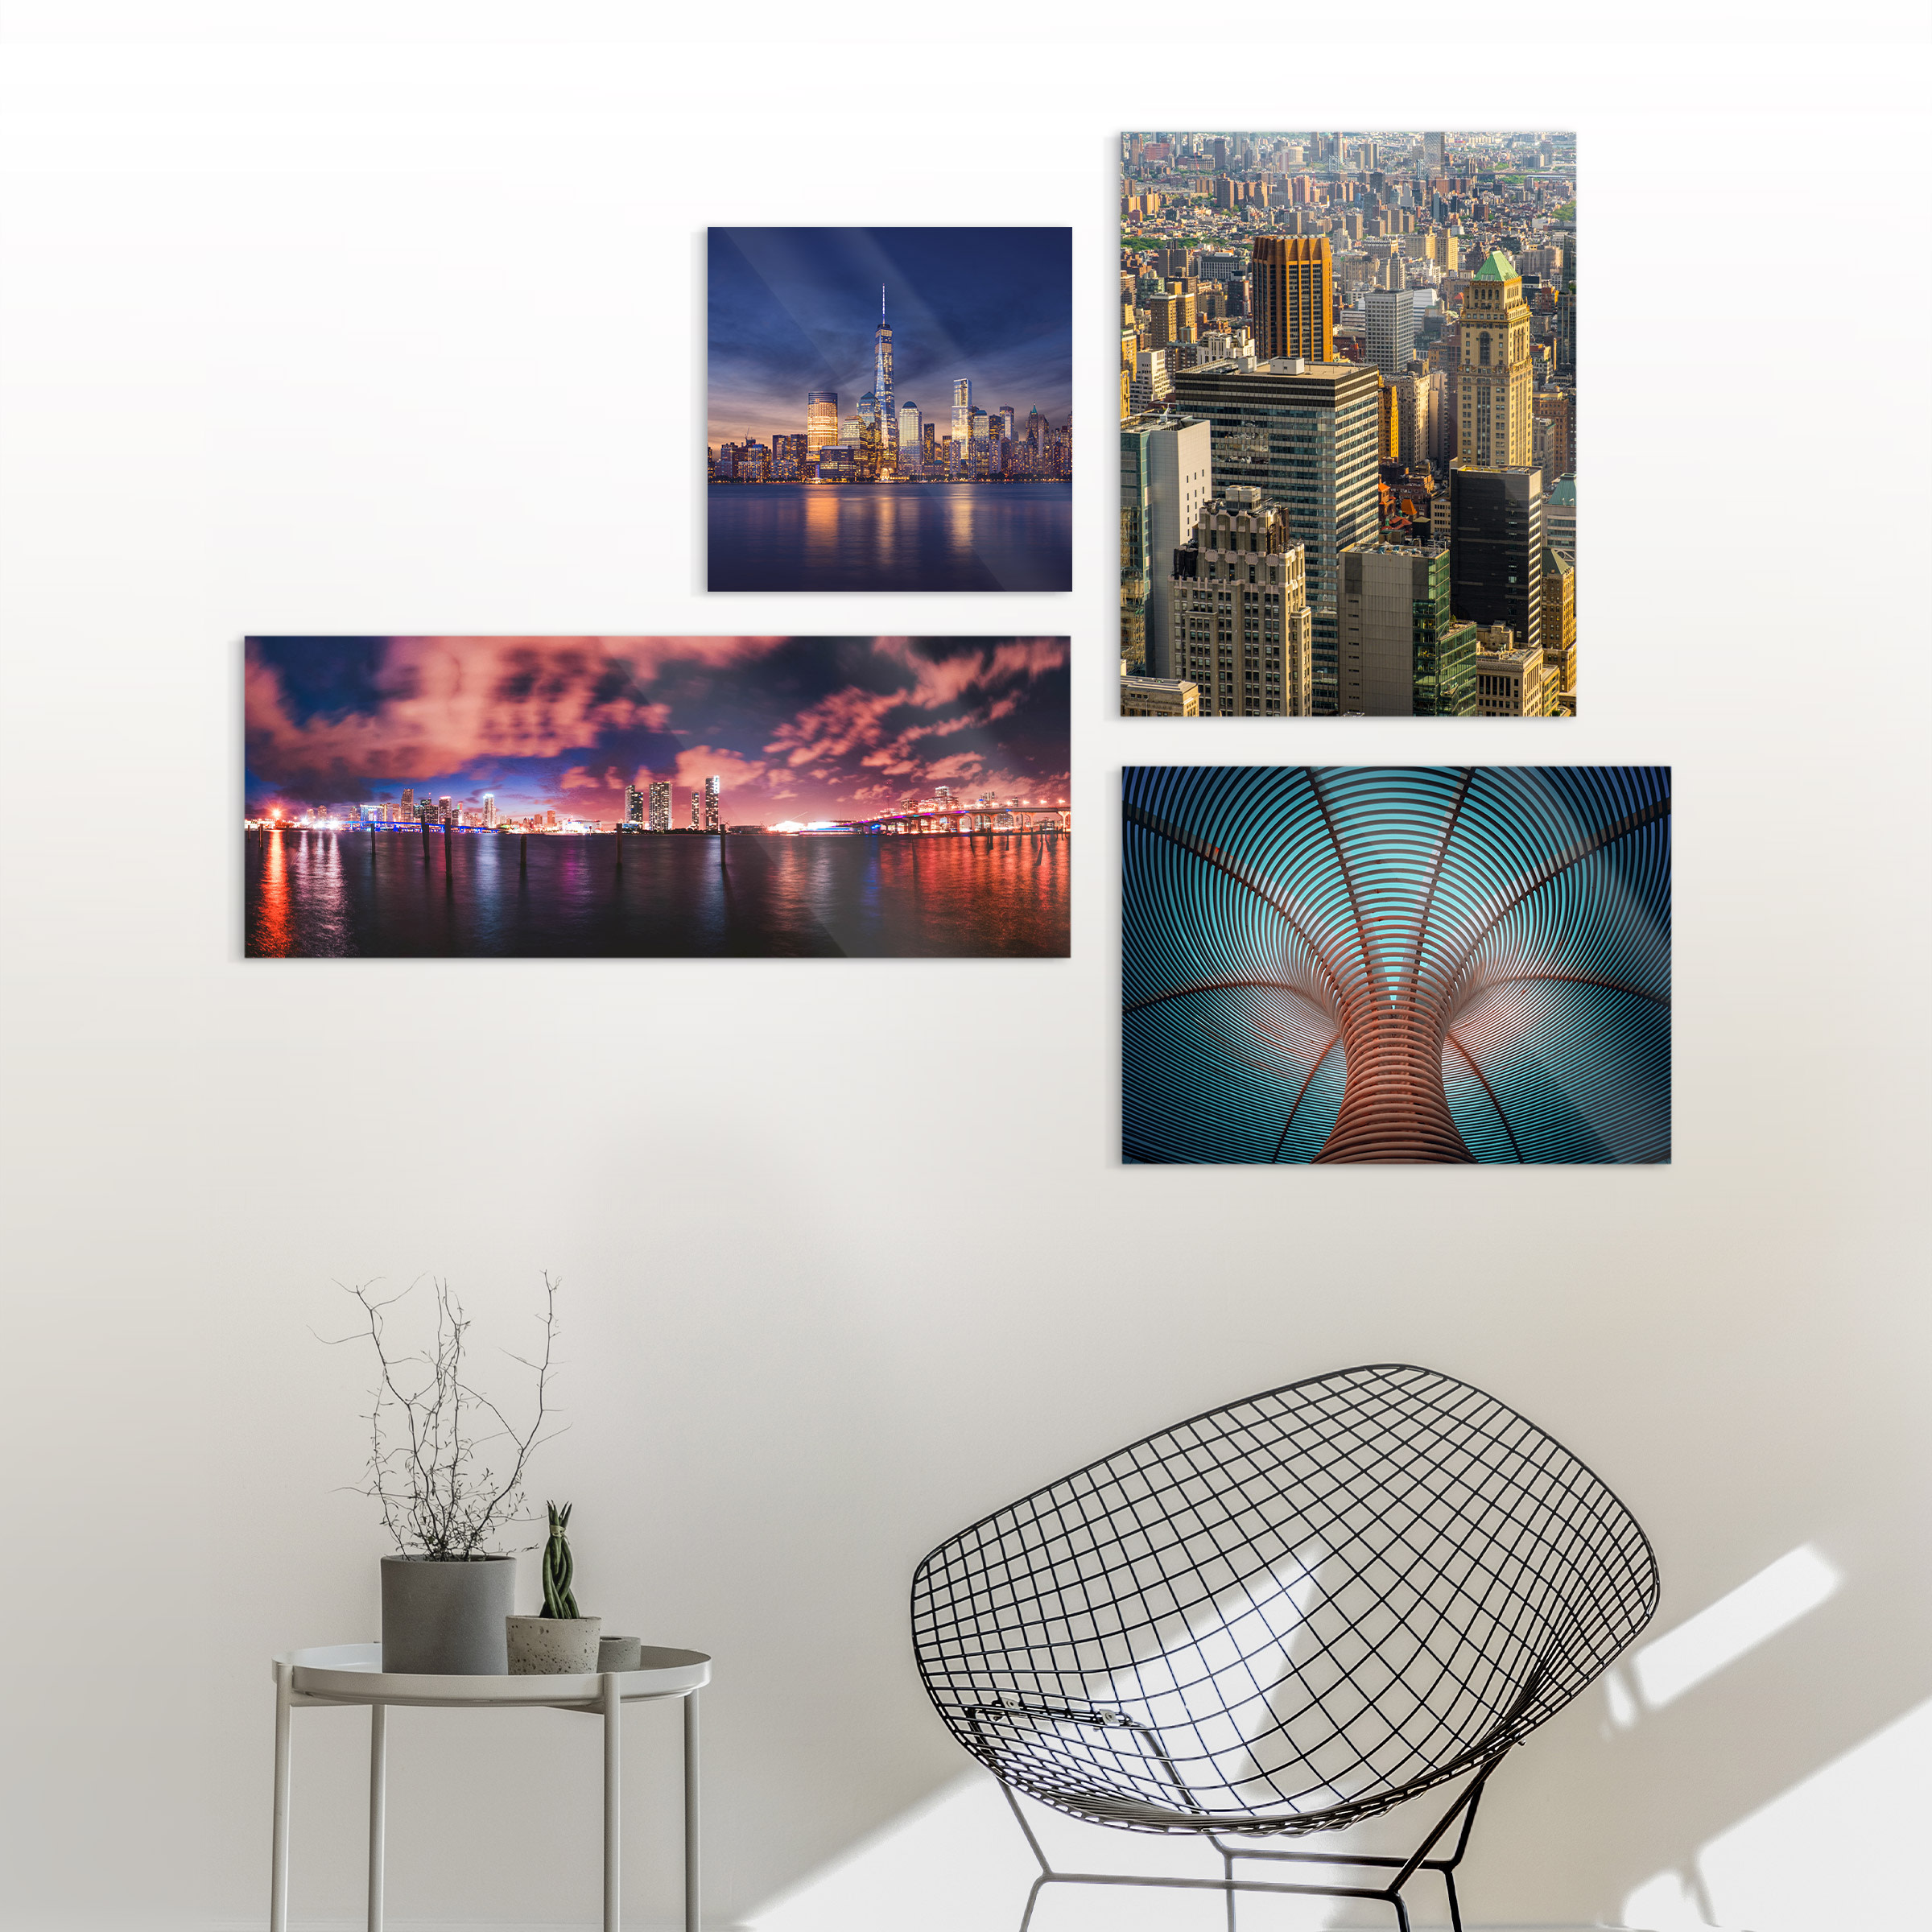 ultrahd-fotoabzug-hinter-acrylglas-stadt-inspiration-1200x1200.jpg